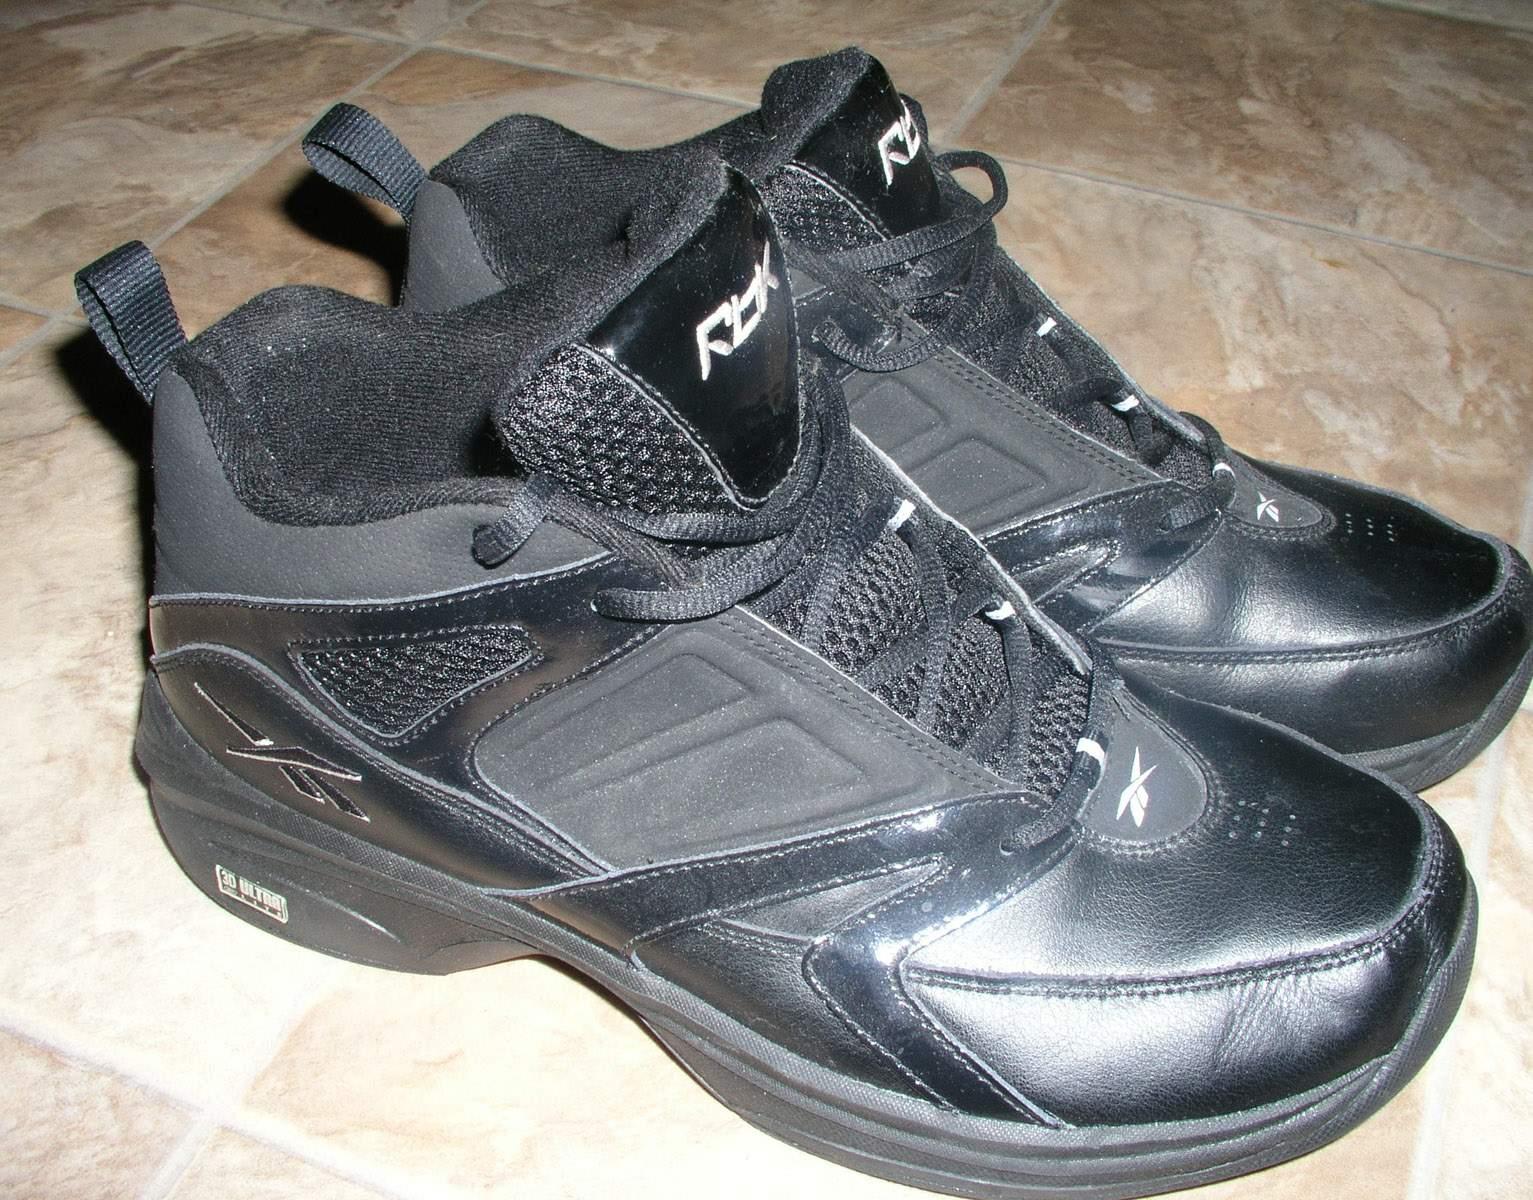 reebok black 10 5 4e wide xwide eeee mens shoes basketball